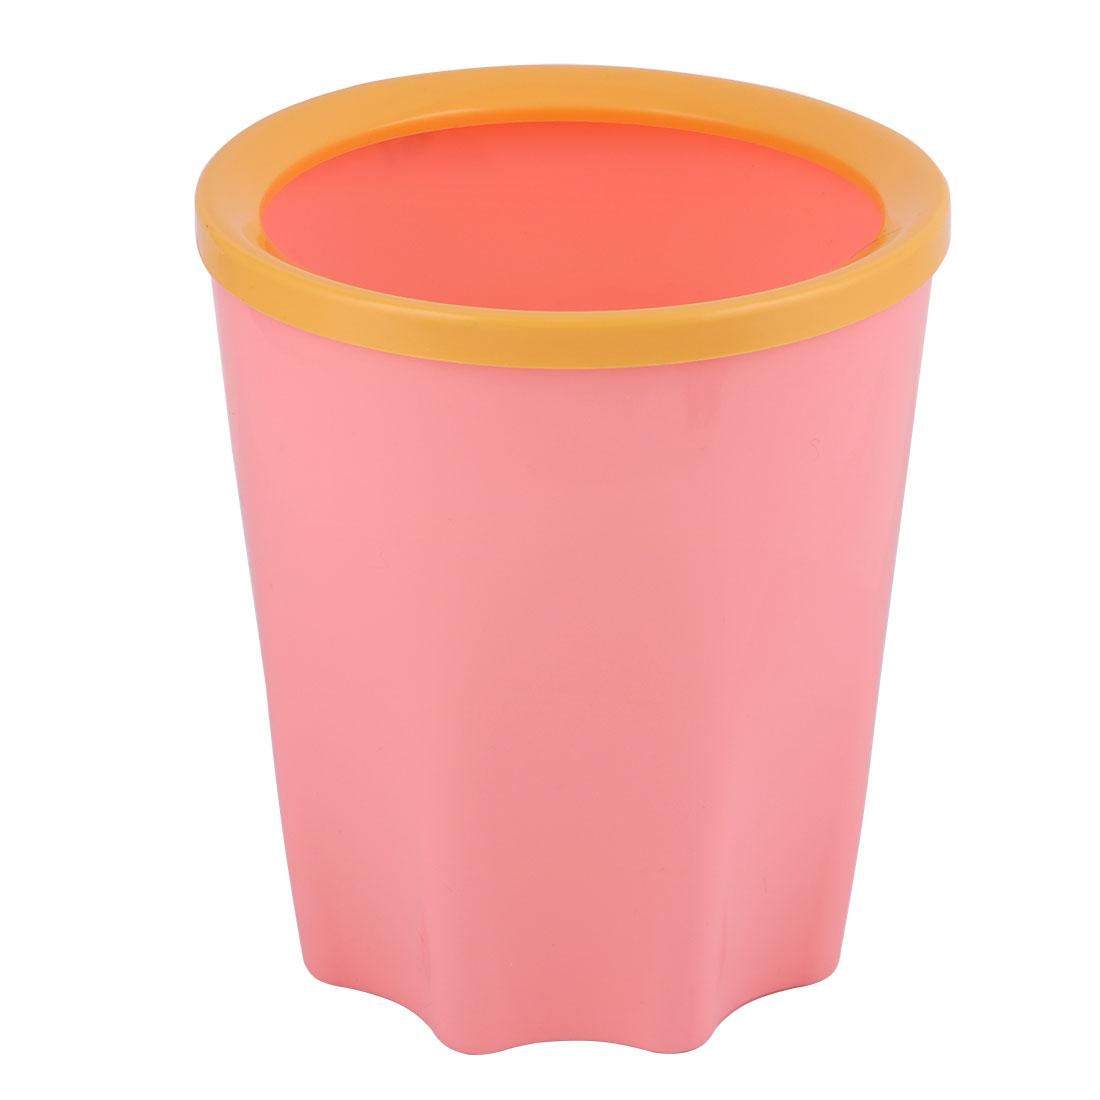 Plastic Table Desktop  Waste Rubbish Bin Garbage Trash Can Pink 17 x 15cm - image 4 of 4